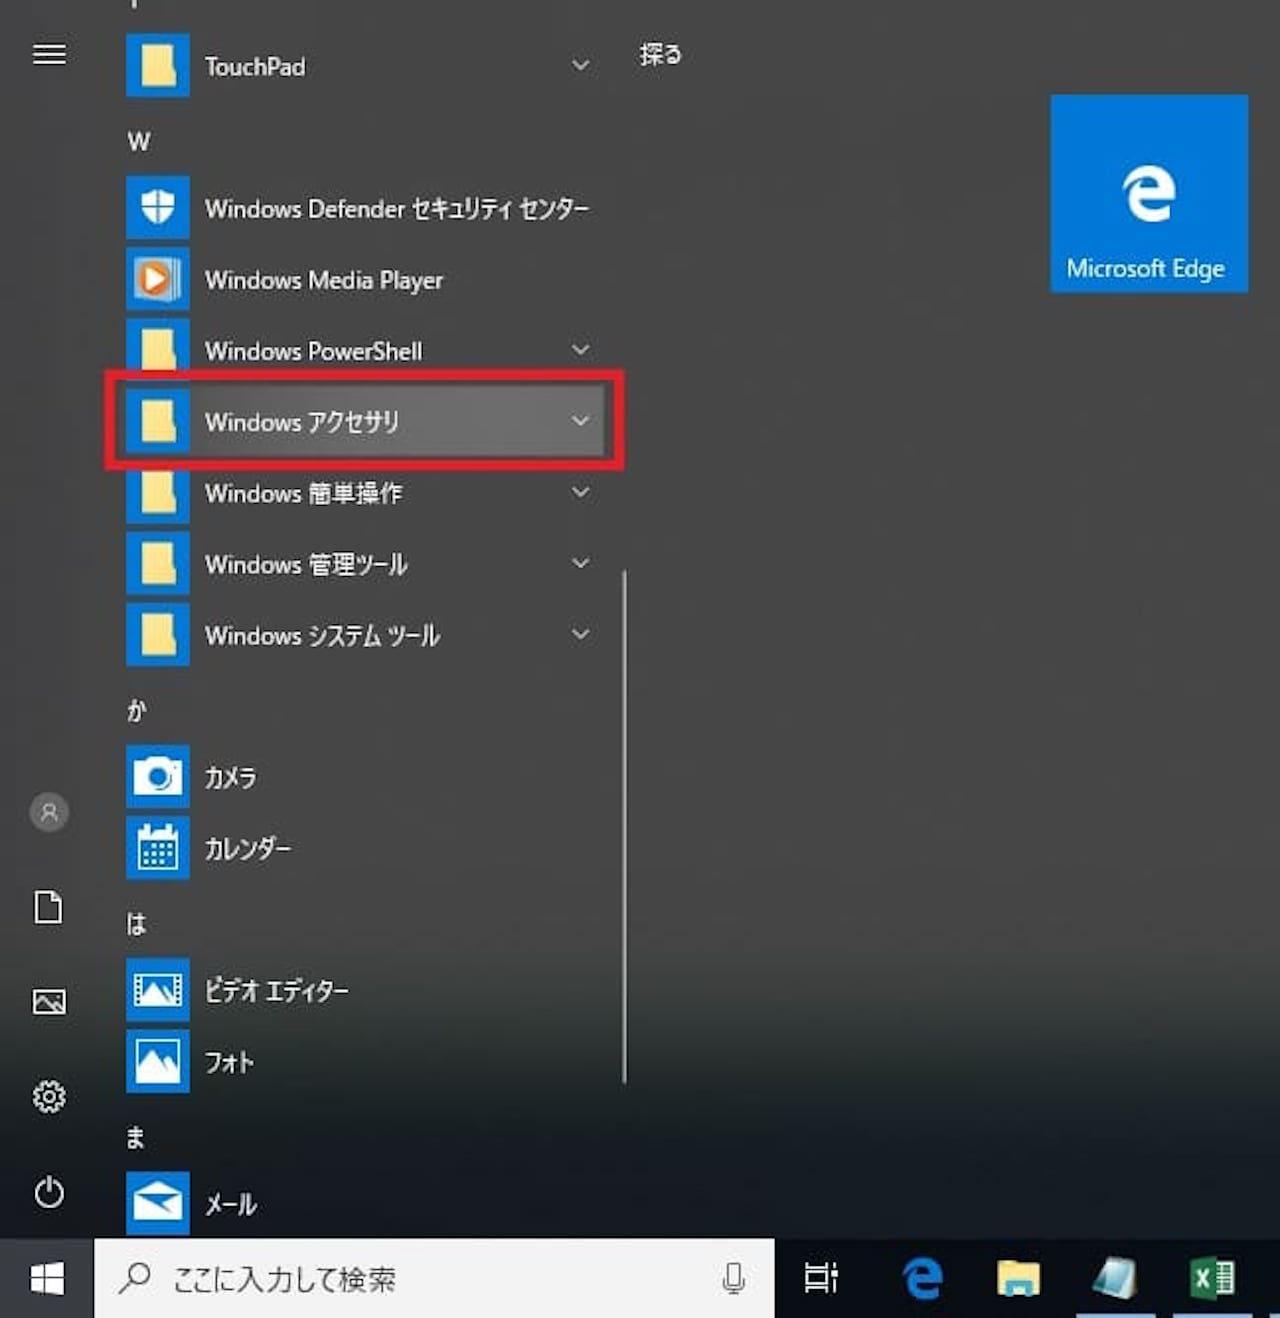 Windows10で撮ったスクリーンショットを画像として保存する方法②